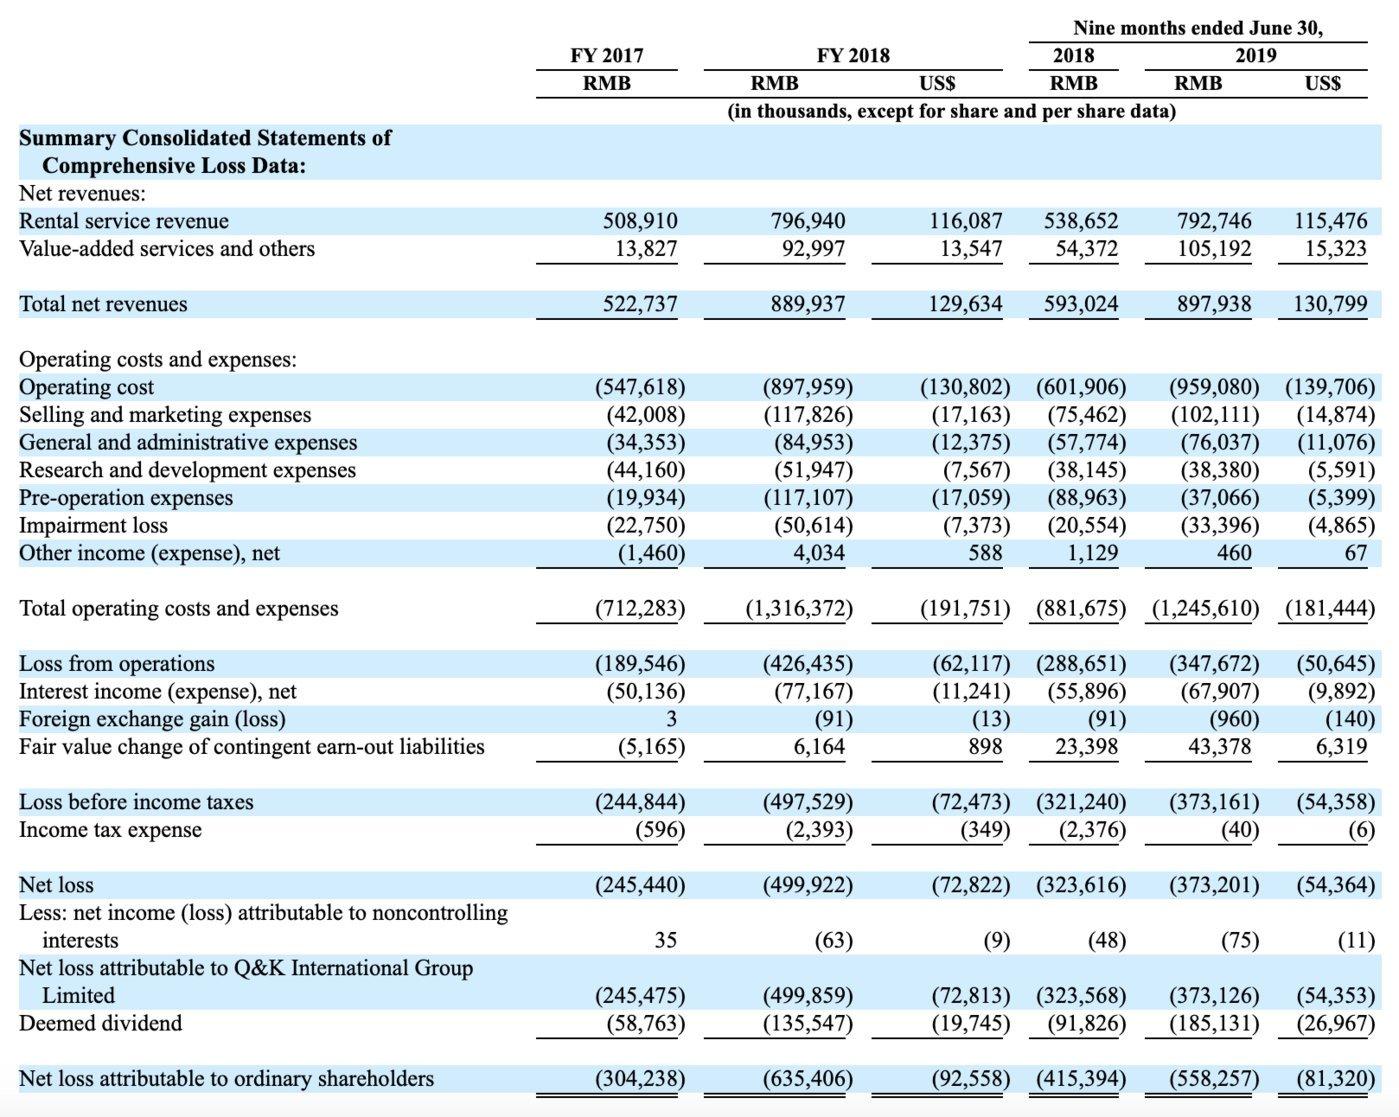 Q&K prospectus financial data